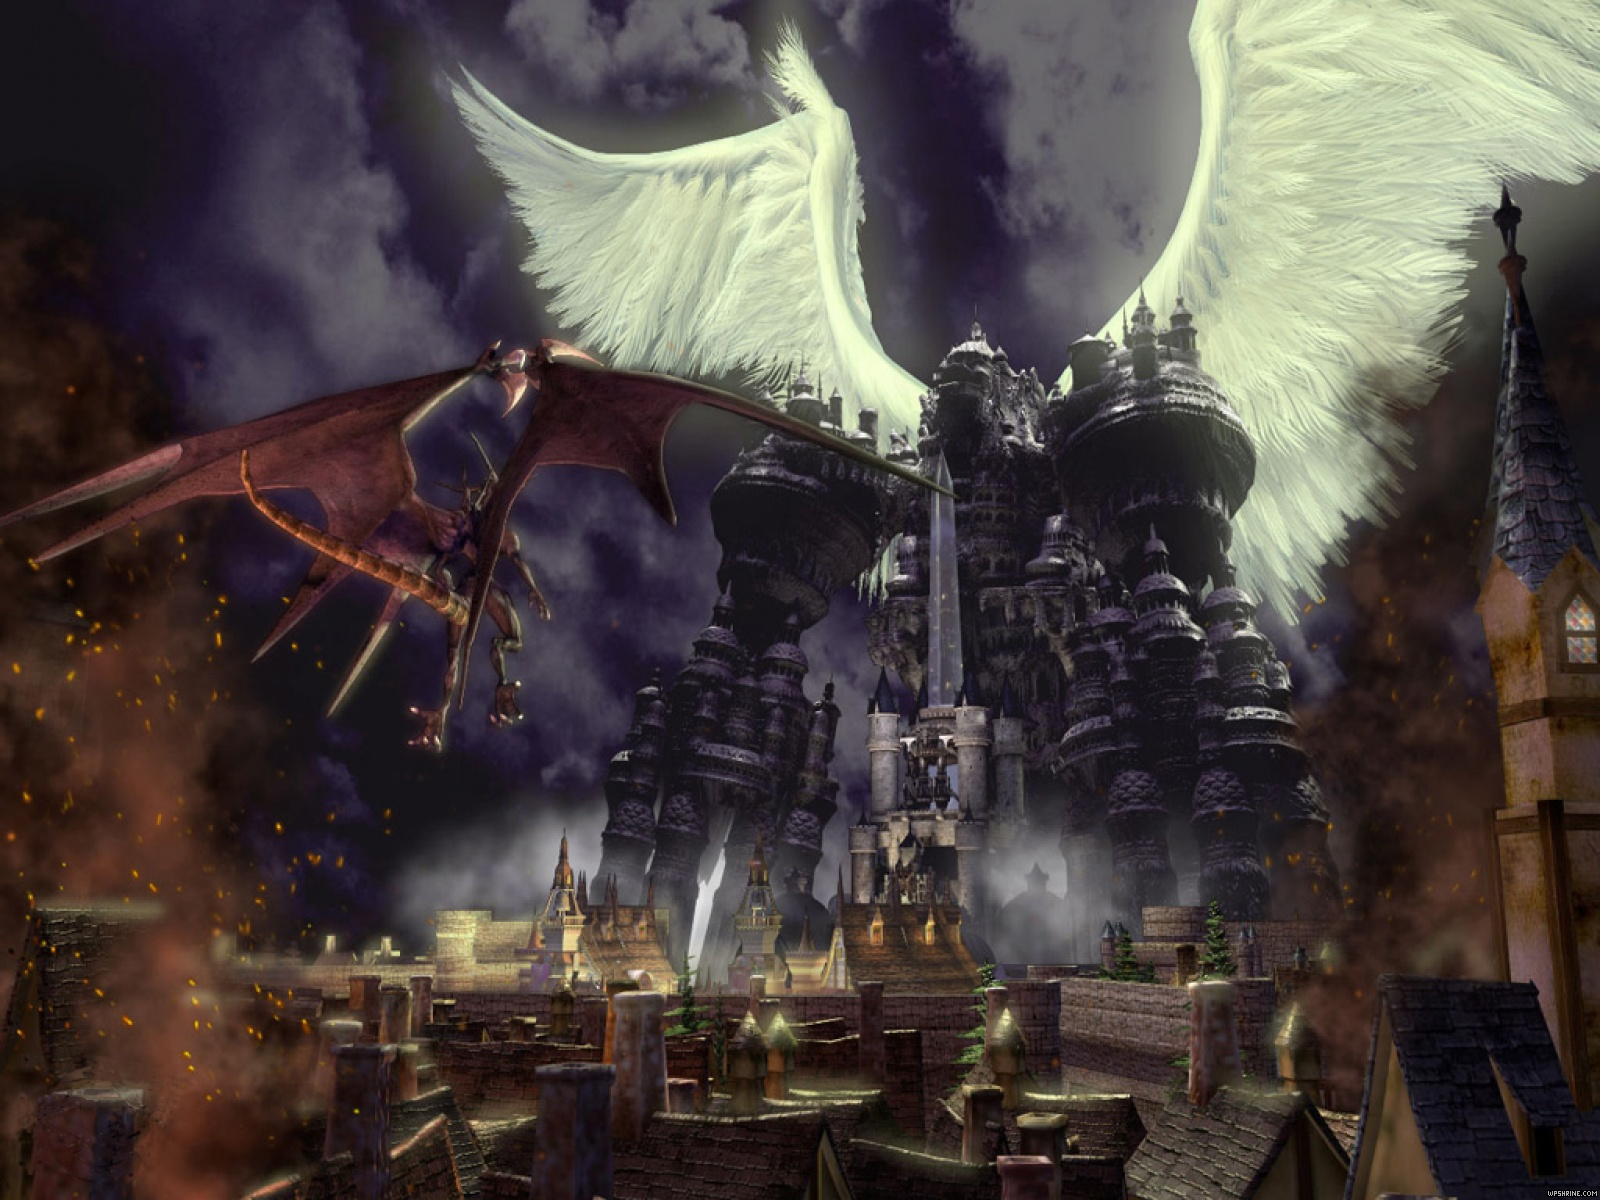 Modojo | Final Fantasy IX Makes Its Way to Mobile